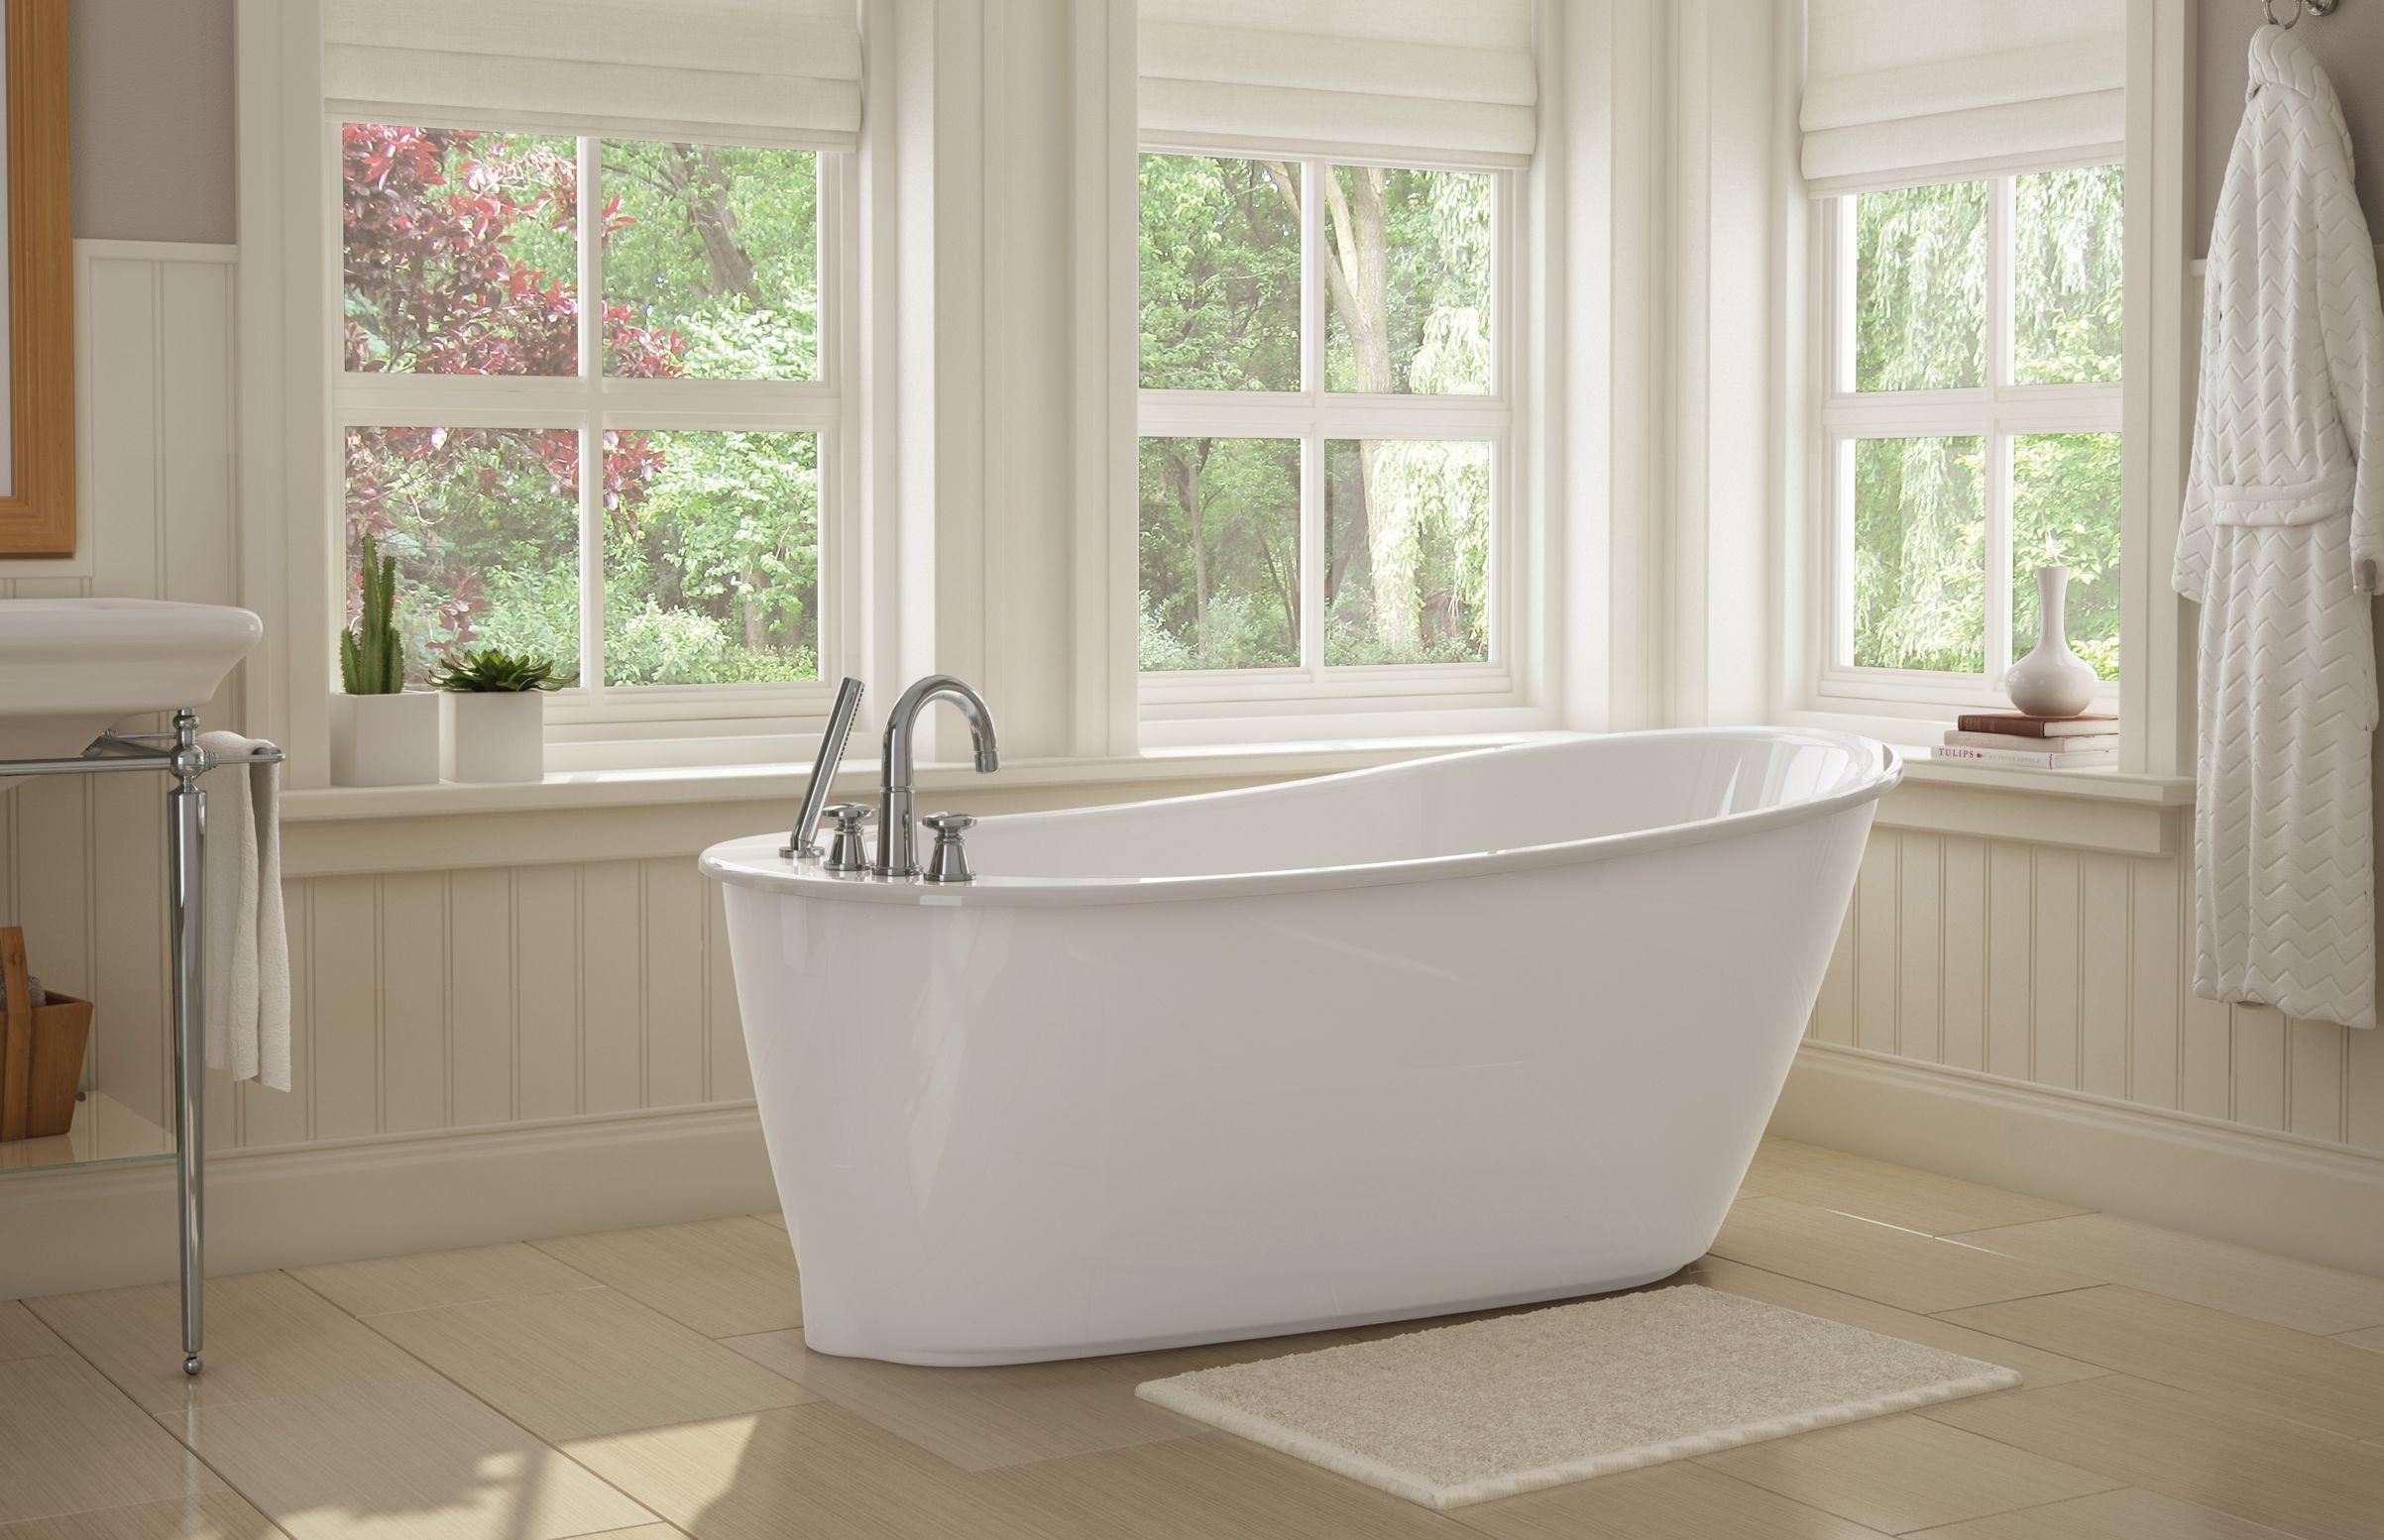 Sax Freestanding Bathtub Maax Bath Inc Sax 105797 Dimensions 60